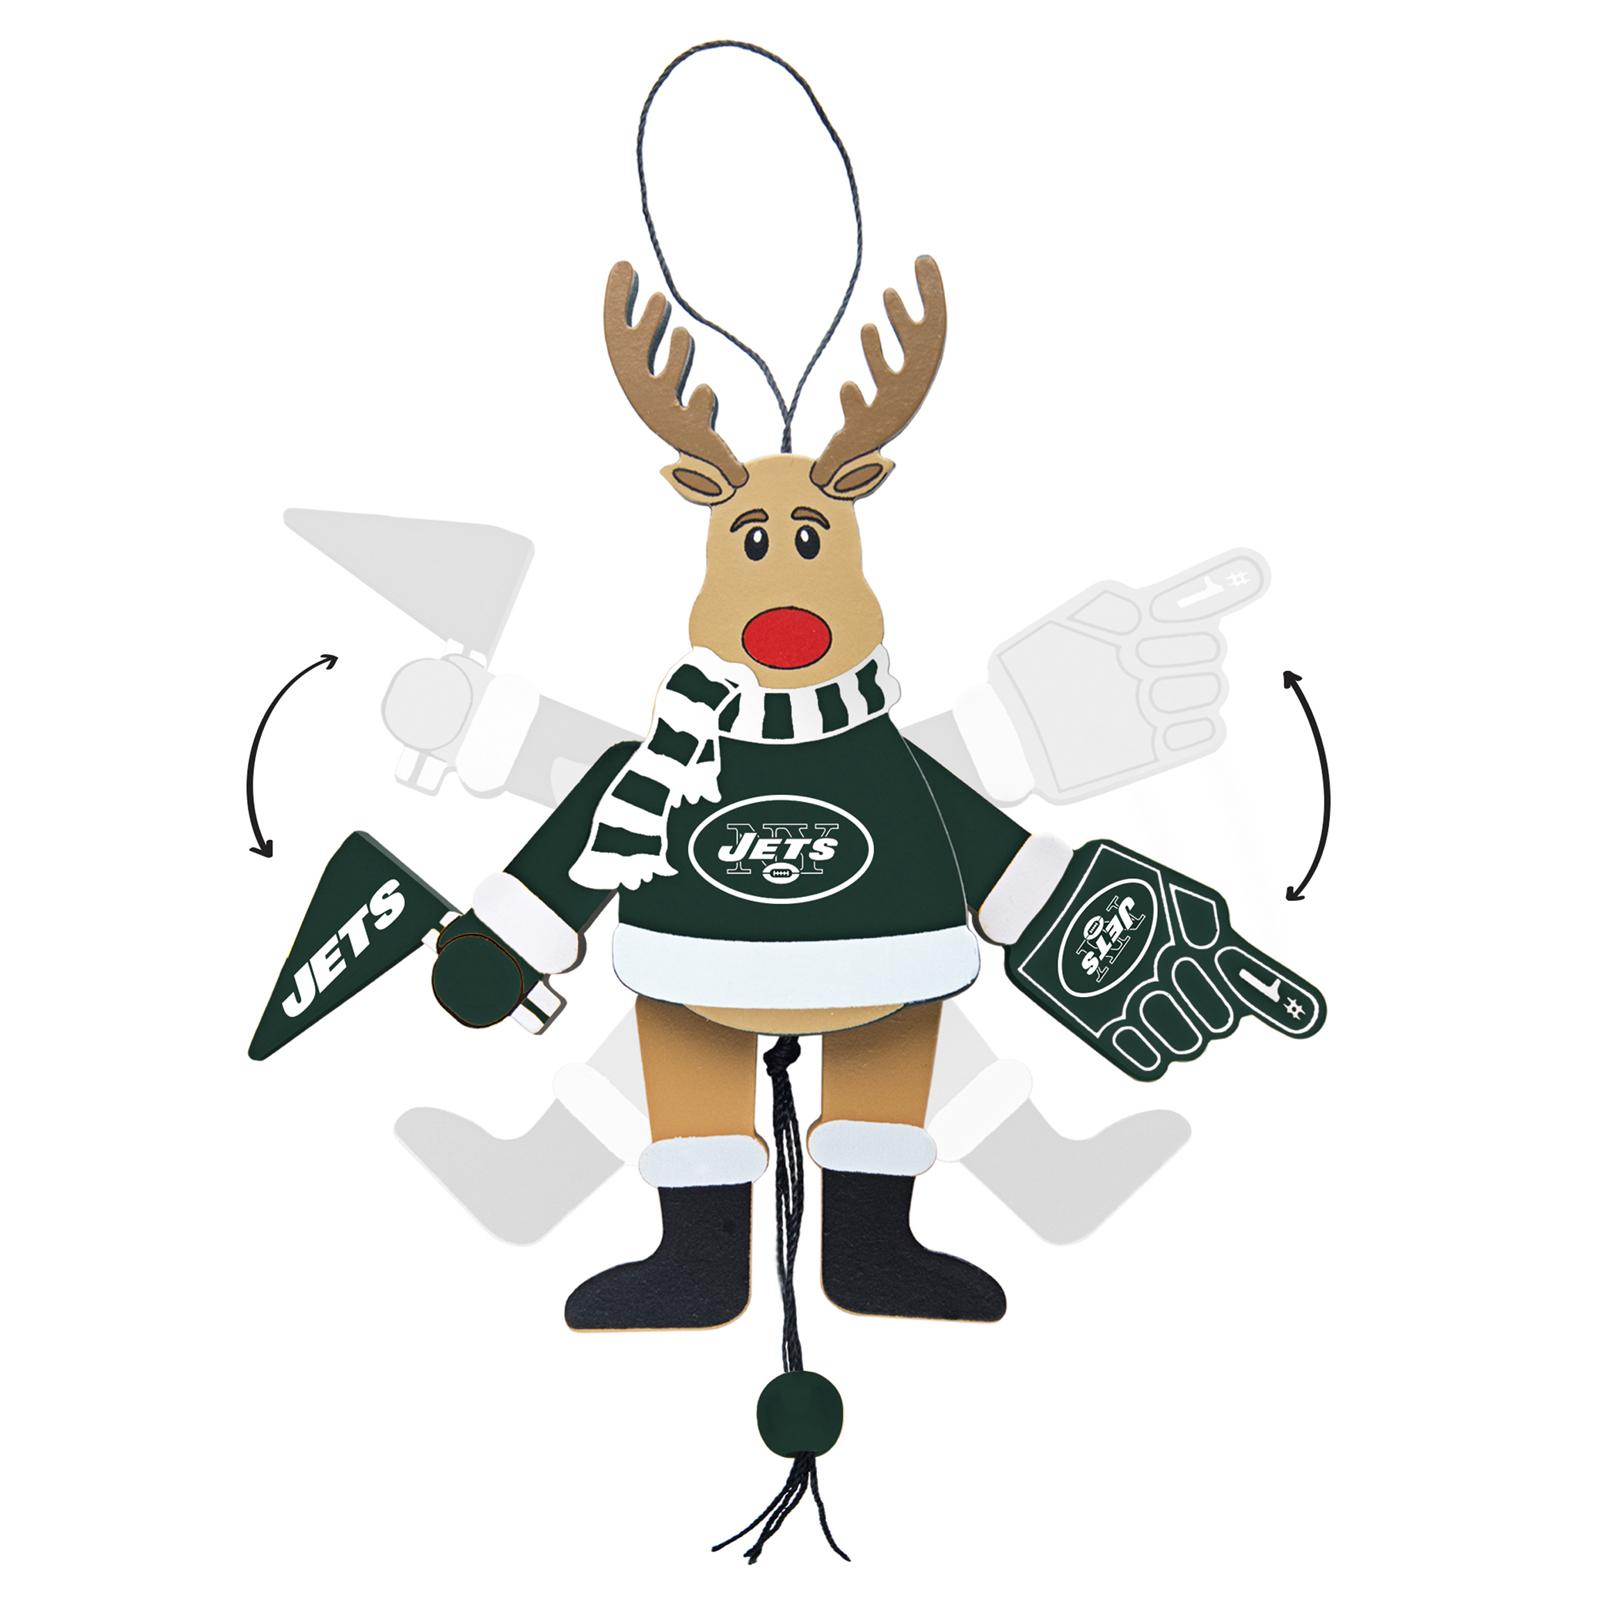 Topperscot NFL Wooden New York Jets Cheering Reindeer Ornament